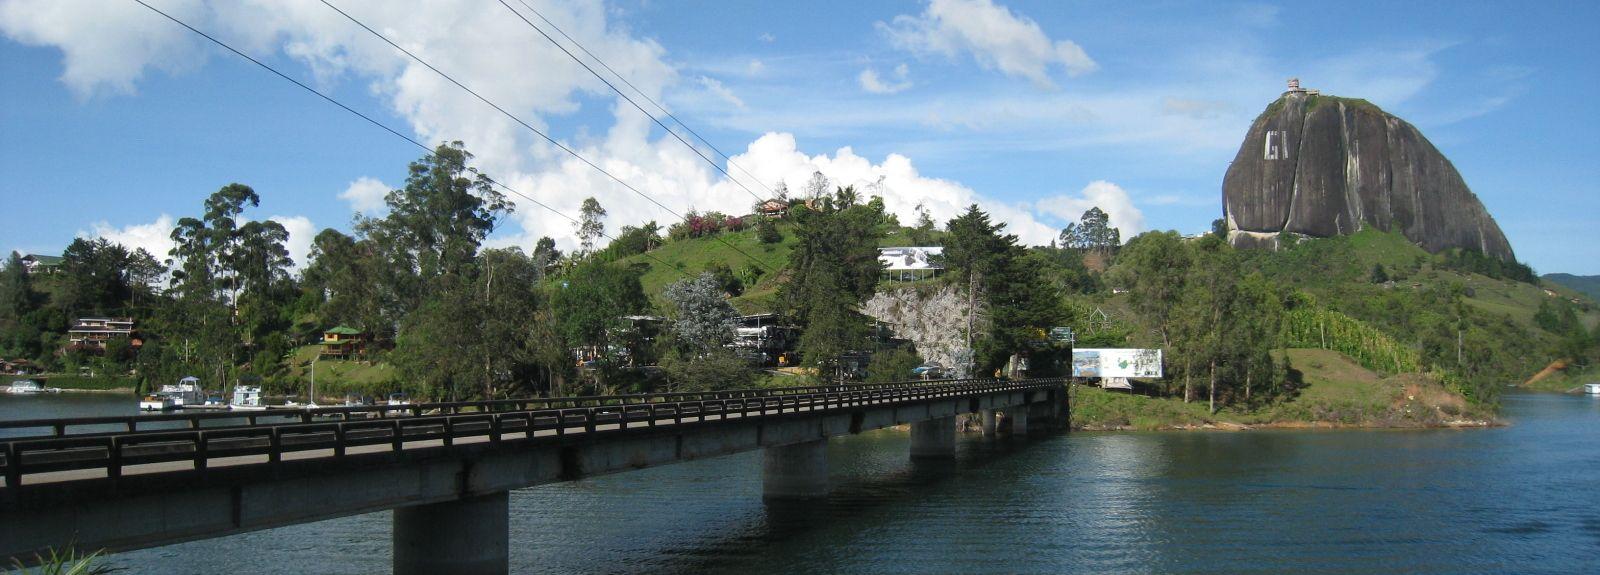 Belen, Medellín, Antioquia, Colombia